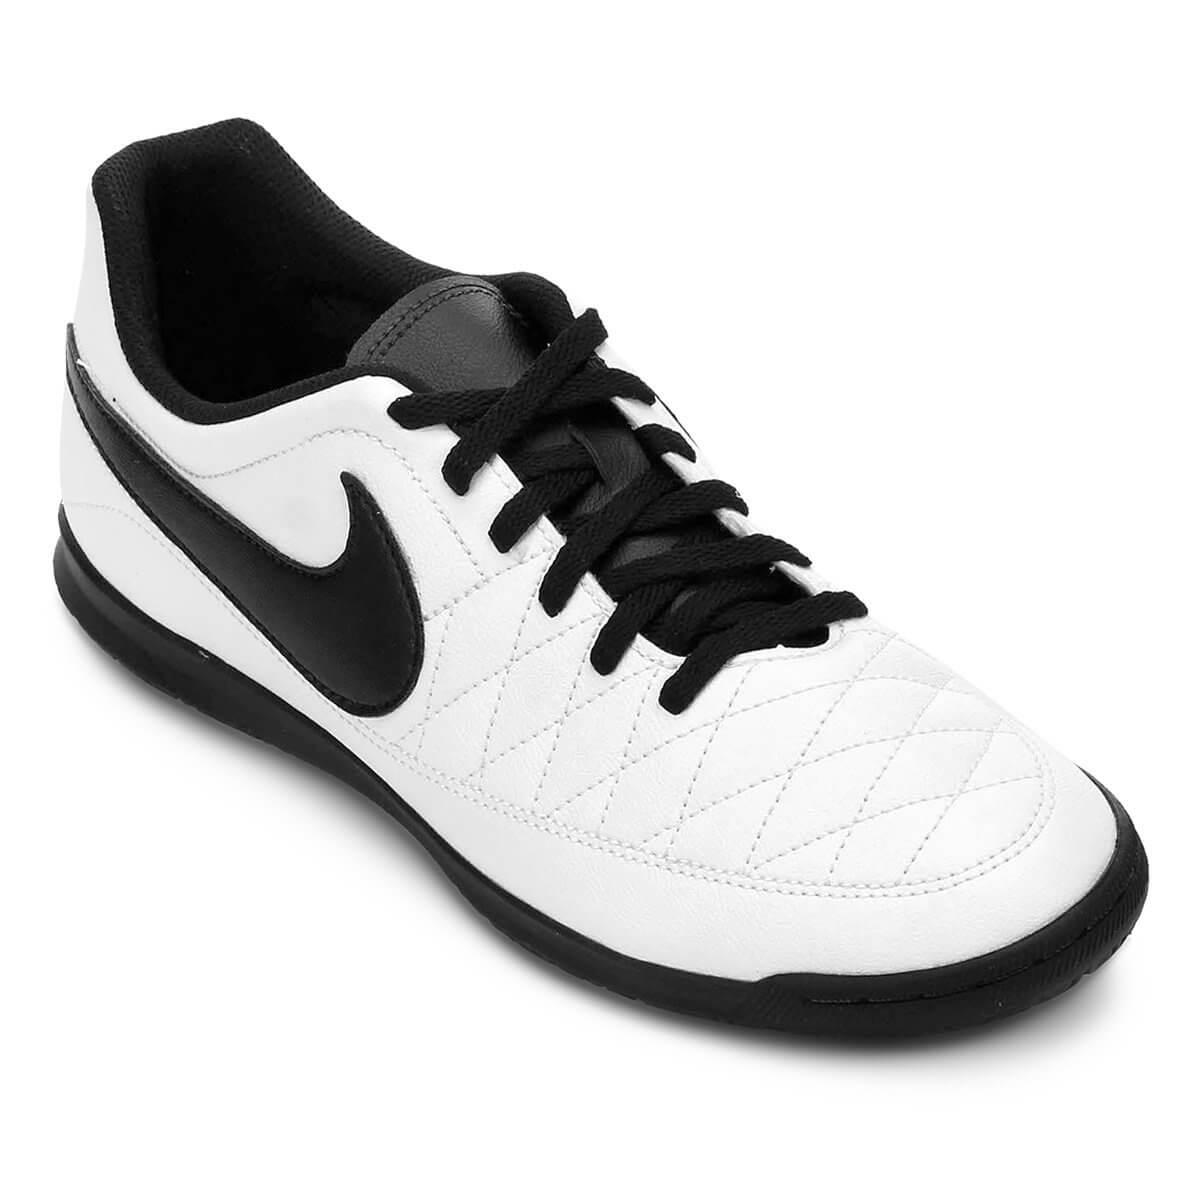 b3b4339149 Chuteira Nike Majestry IC Indoor Masculina - Decker Online!